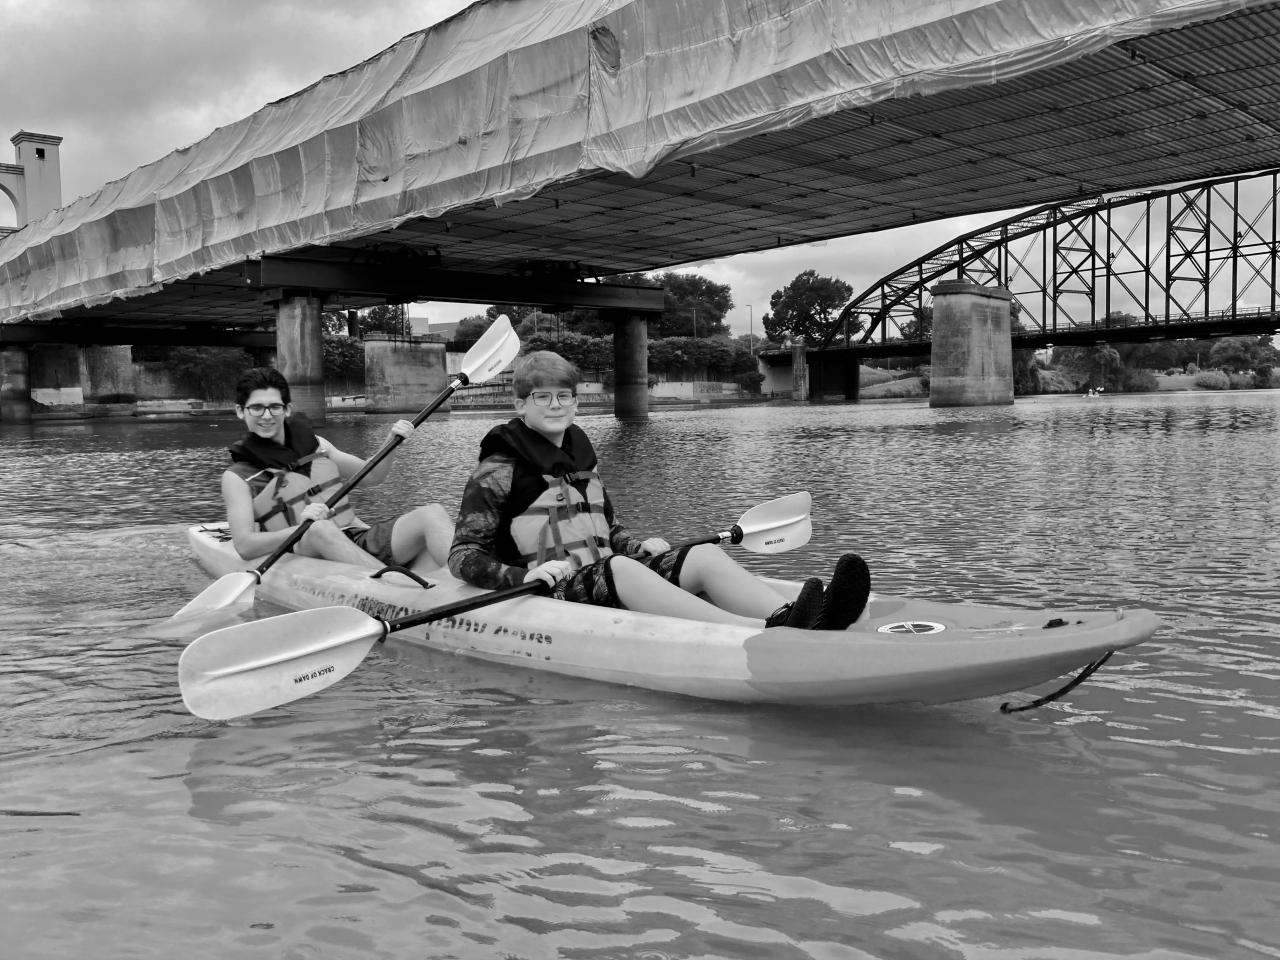 Kayaking On theBrazos